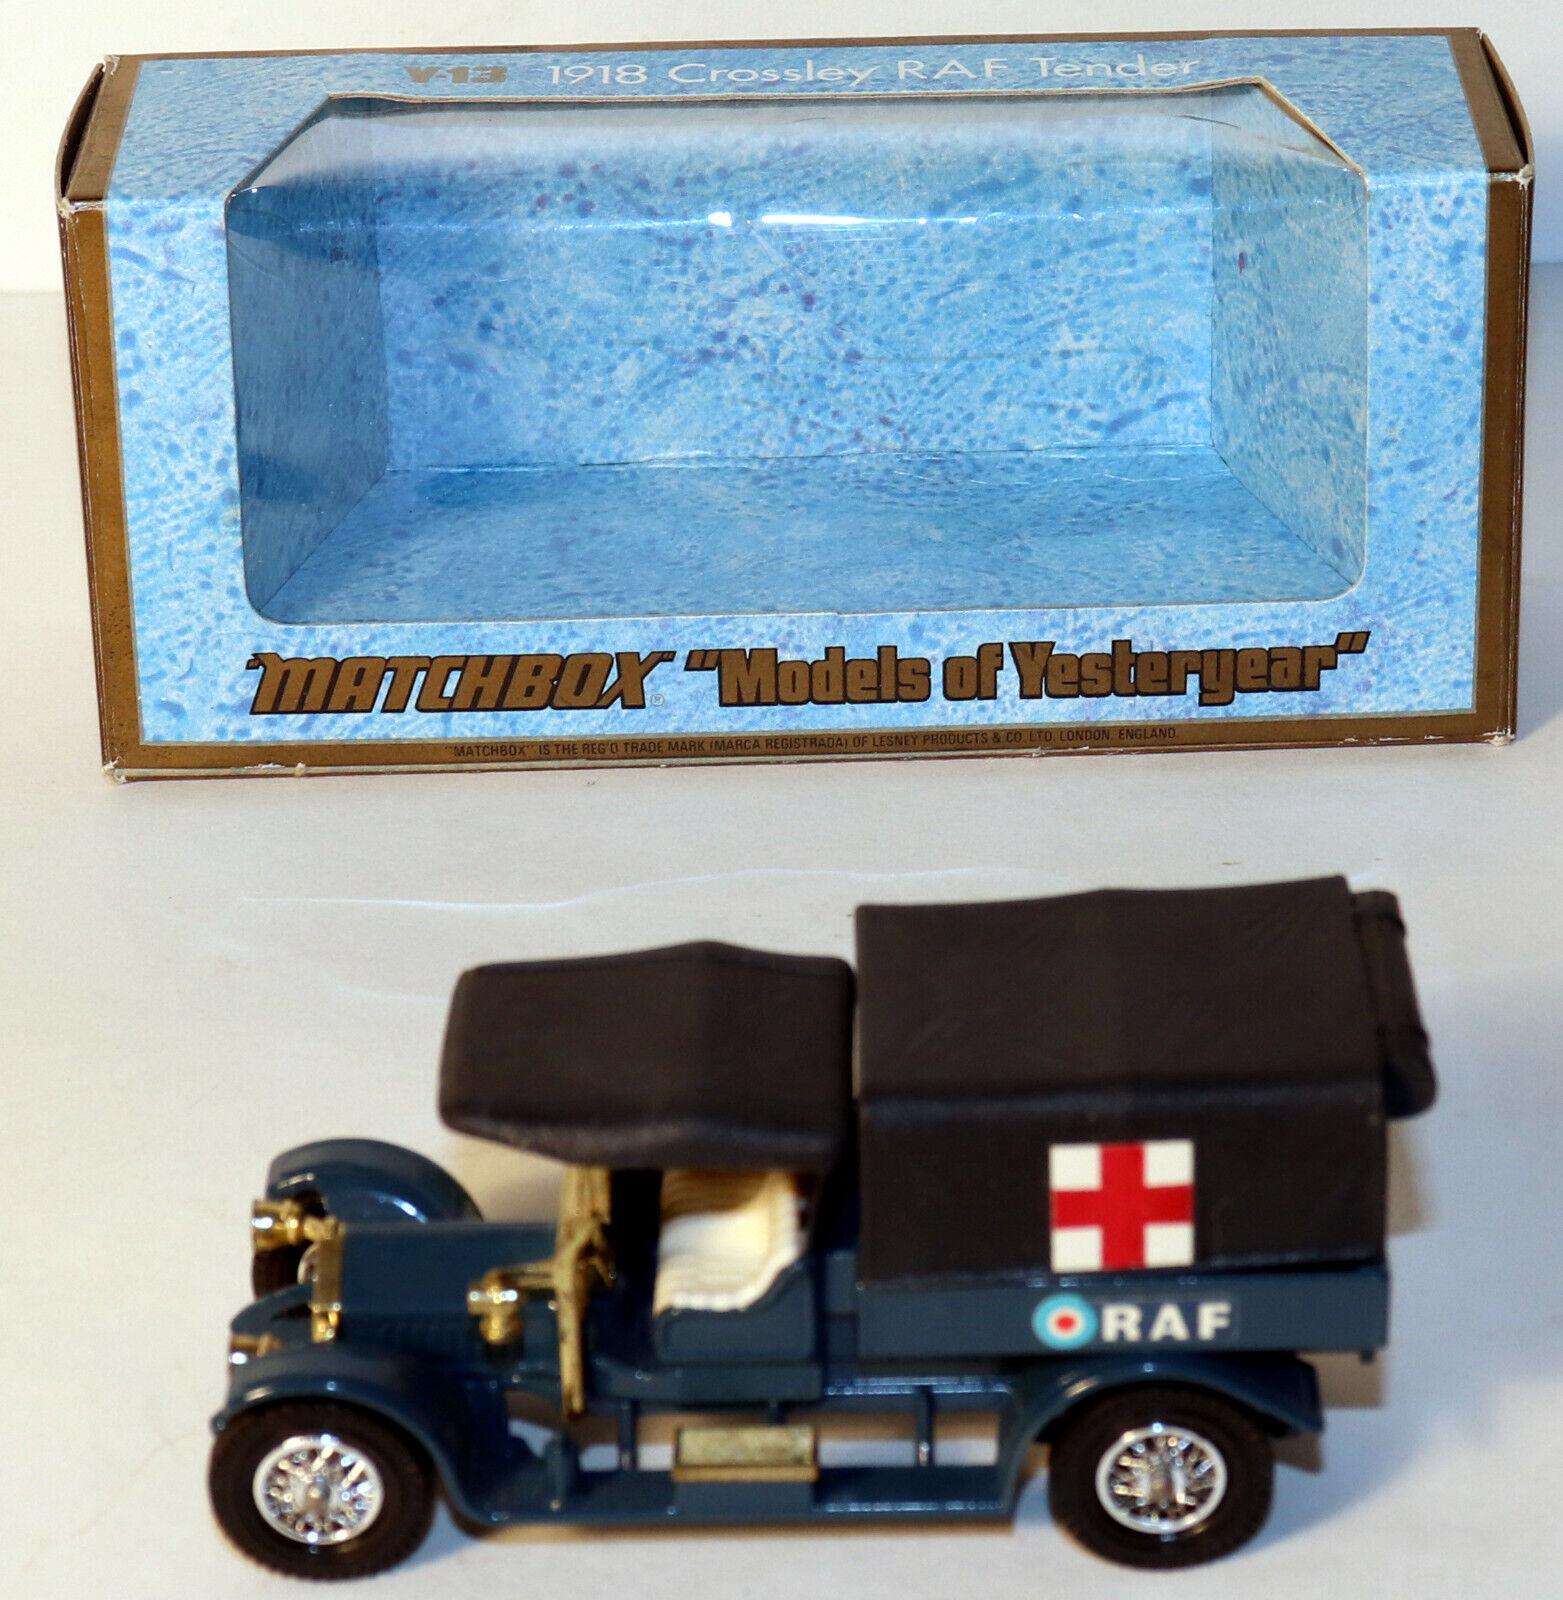 buena calidad DTE Lesney Matchbox Models Models Models Of Yesteryear Y-13 rara Techo Negro & dosel RAF Nuevo en Caja Original  Venta barata